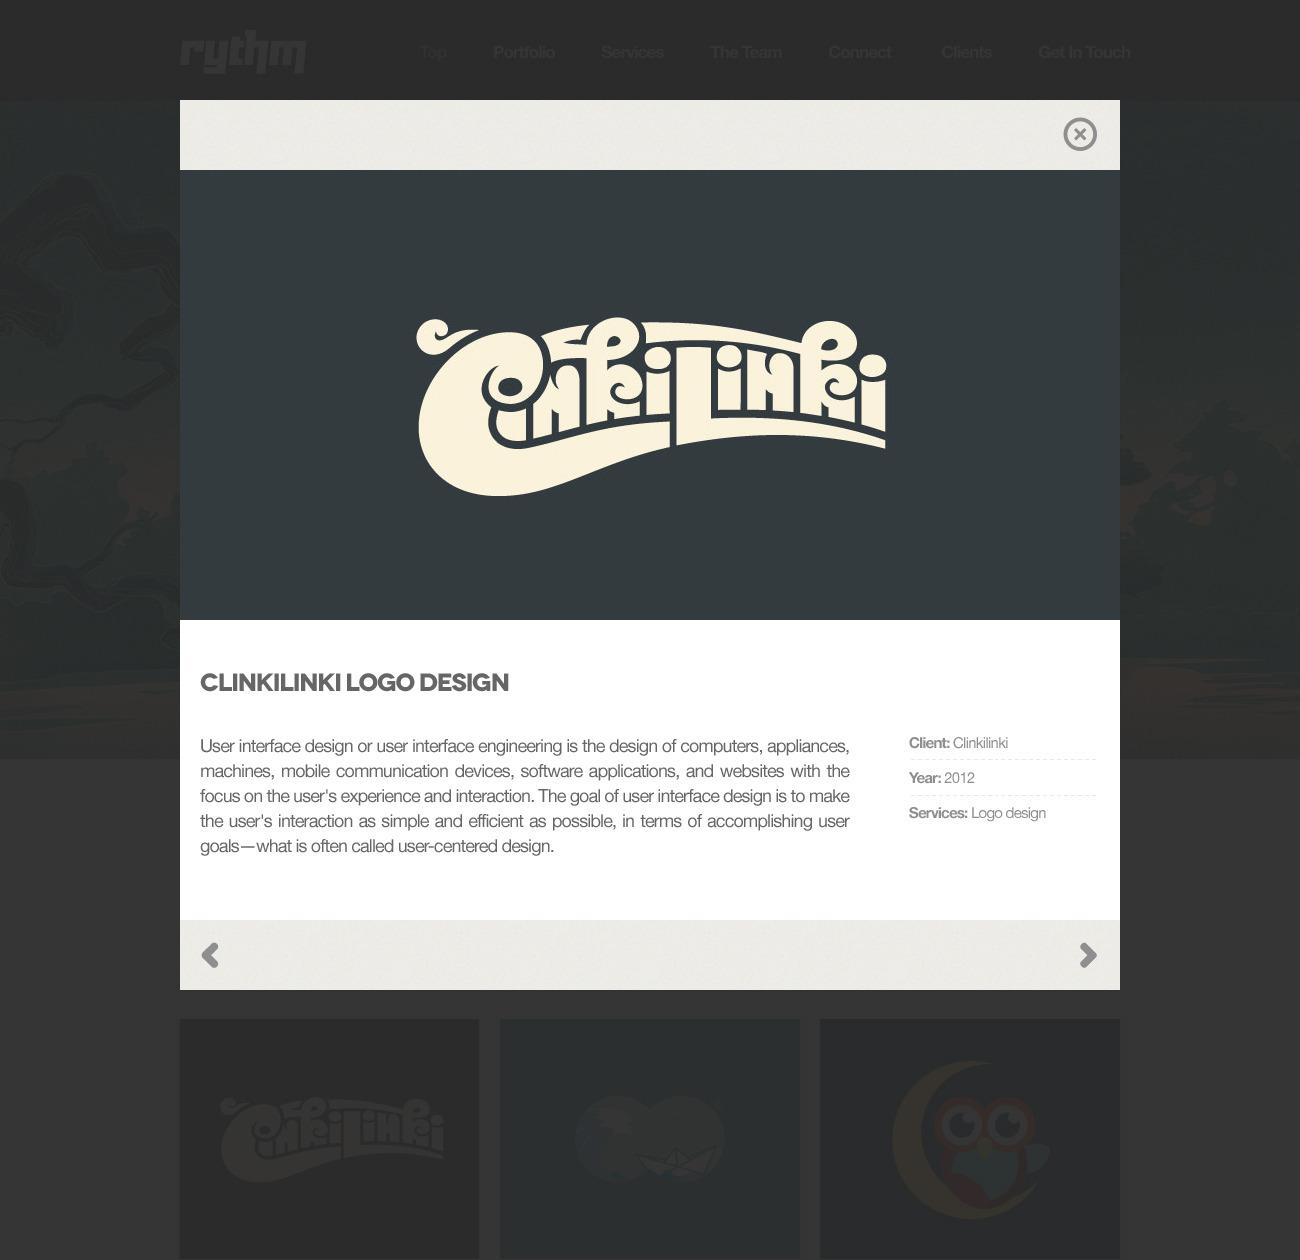 Rythm - A one-page .psd theme for creatives